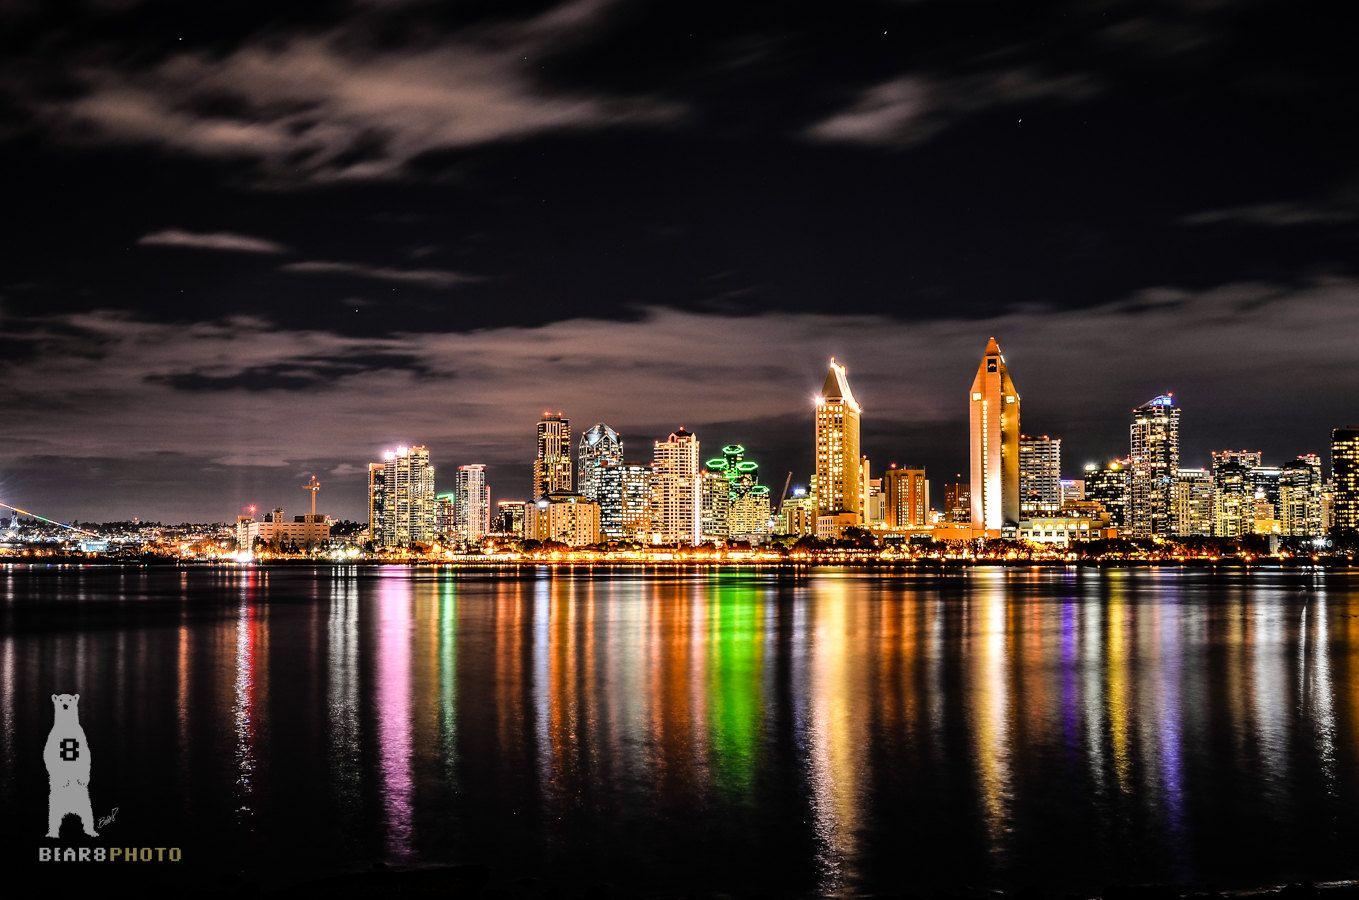 San Diego Skyline City Landscapes Travel Photography Etsy City Landscape Landscape Photography Cityscape